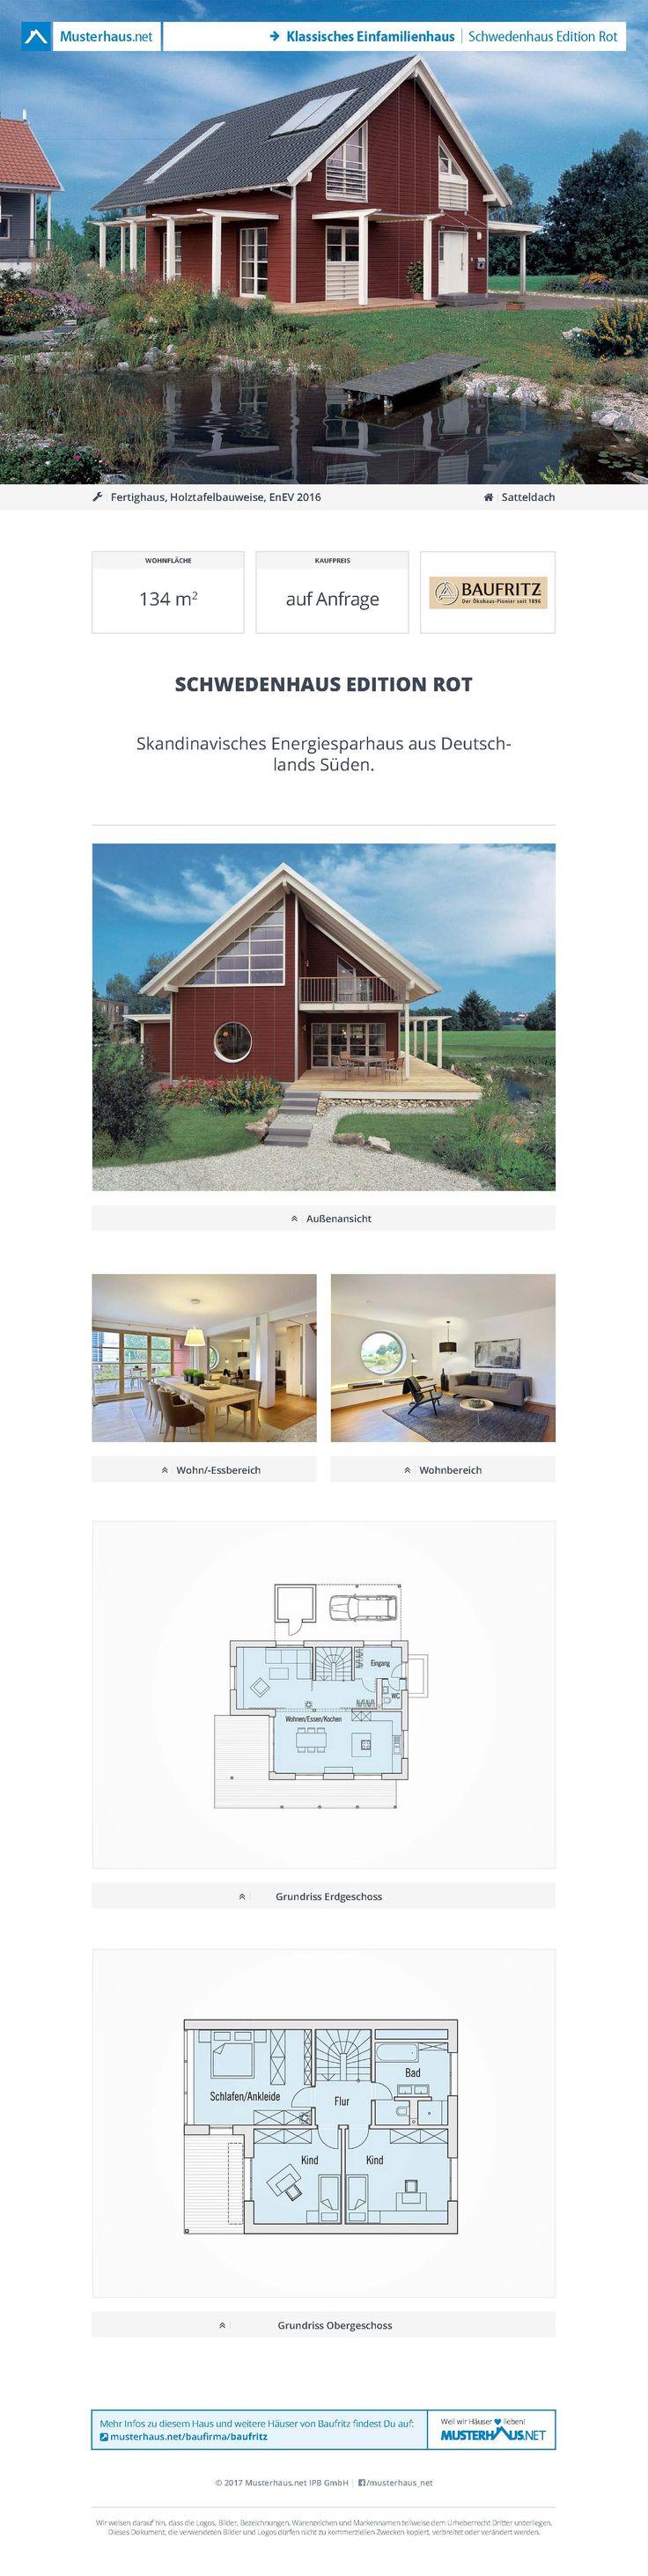 12 best Blockhaus images by Musterhaus.net on Pinterest | Satteldach ...